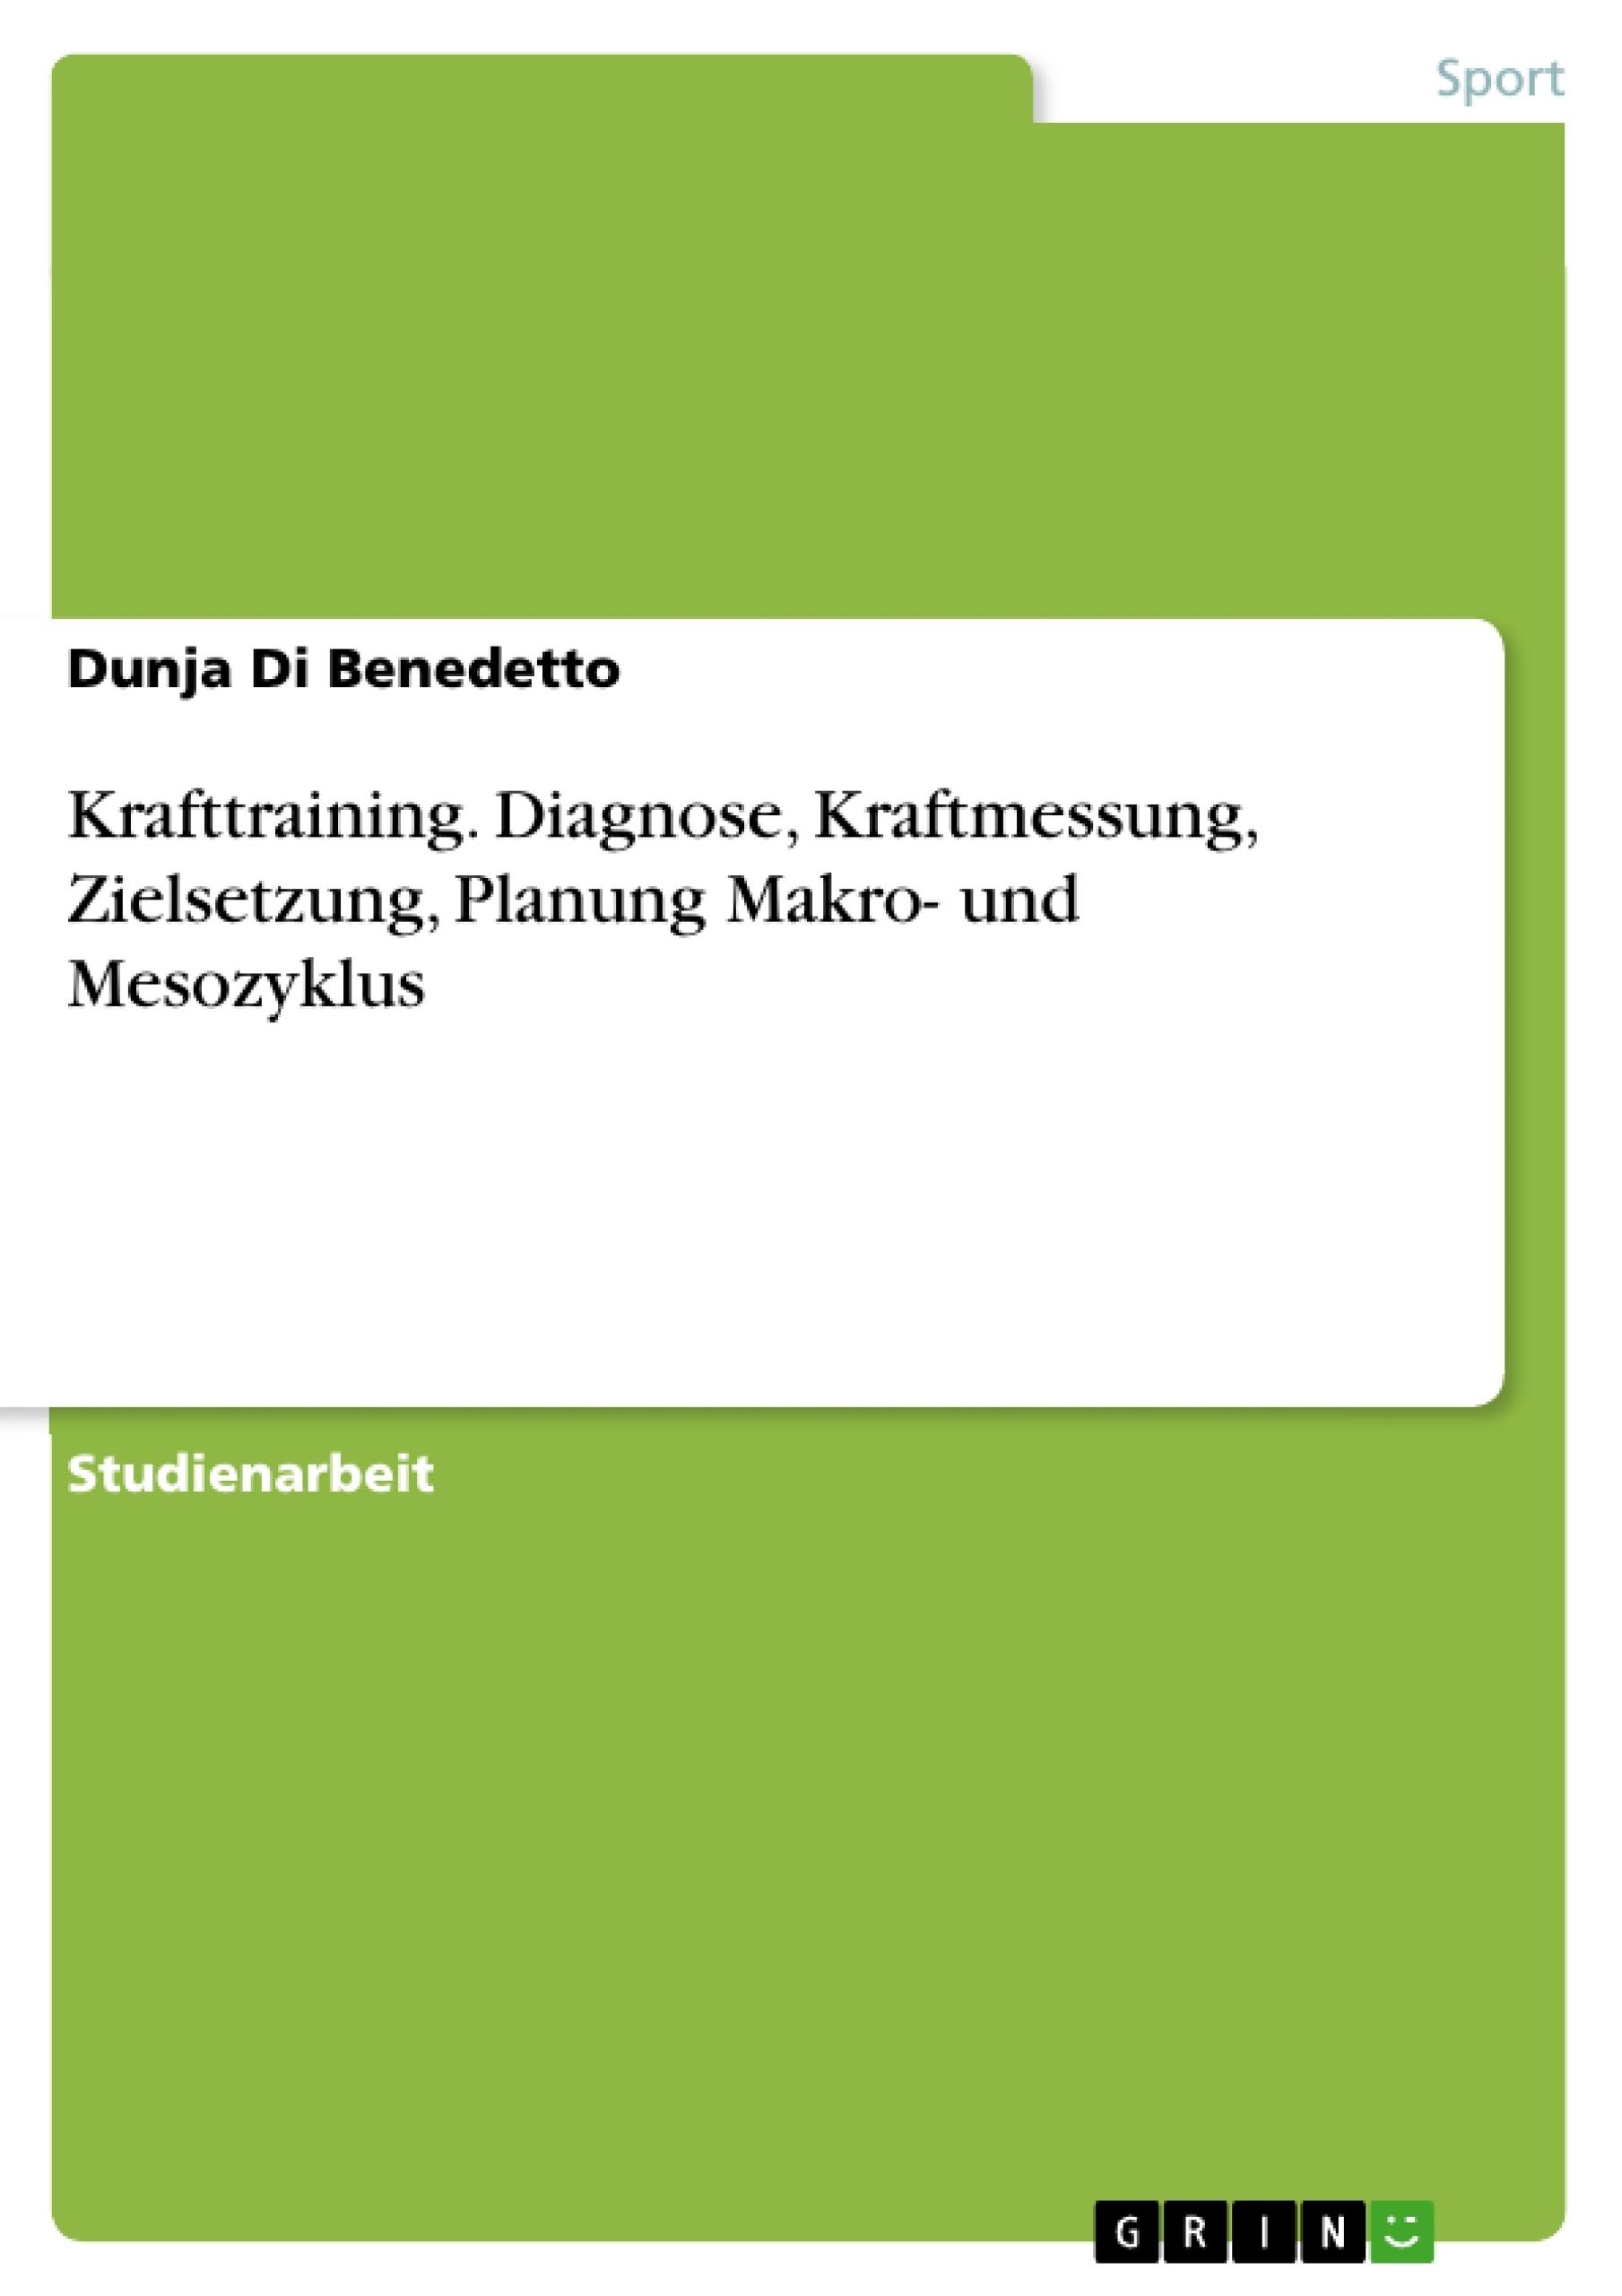 Titel: Krafttraining. Diagnose, Kraftmessung, Zielsetzung, Planung Makro- und Mesozyklus